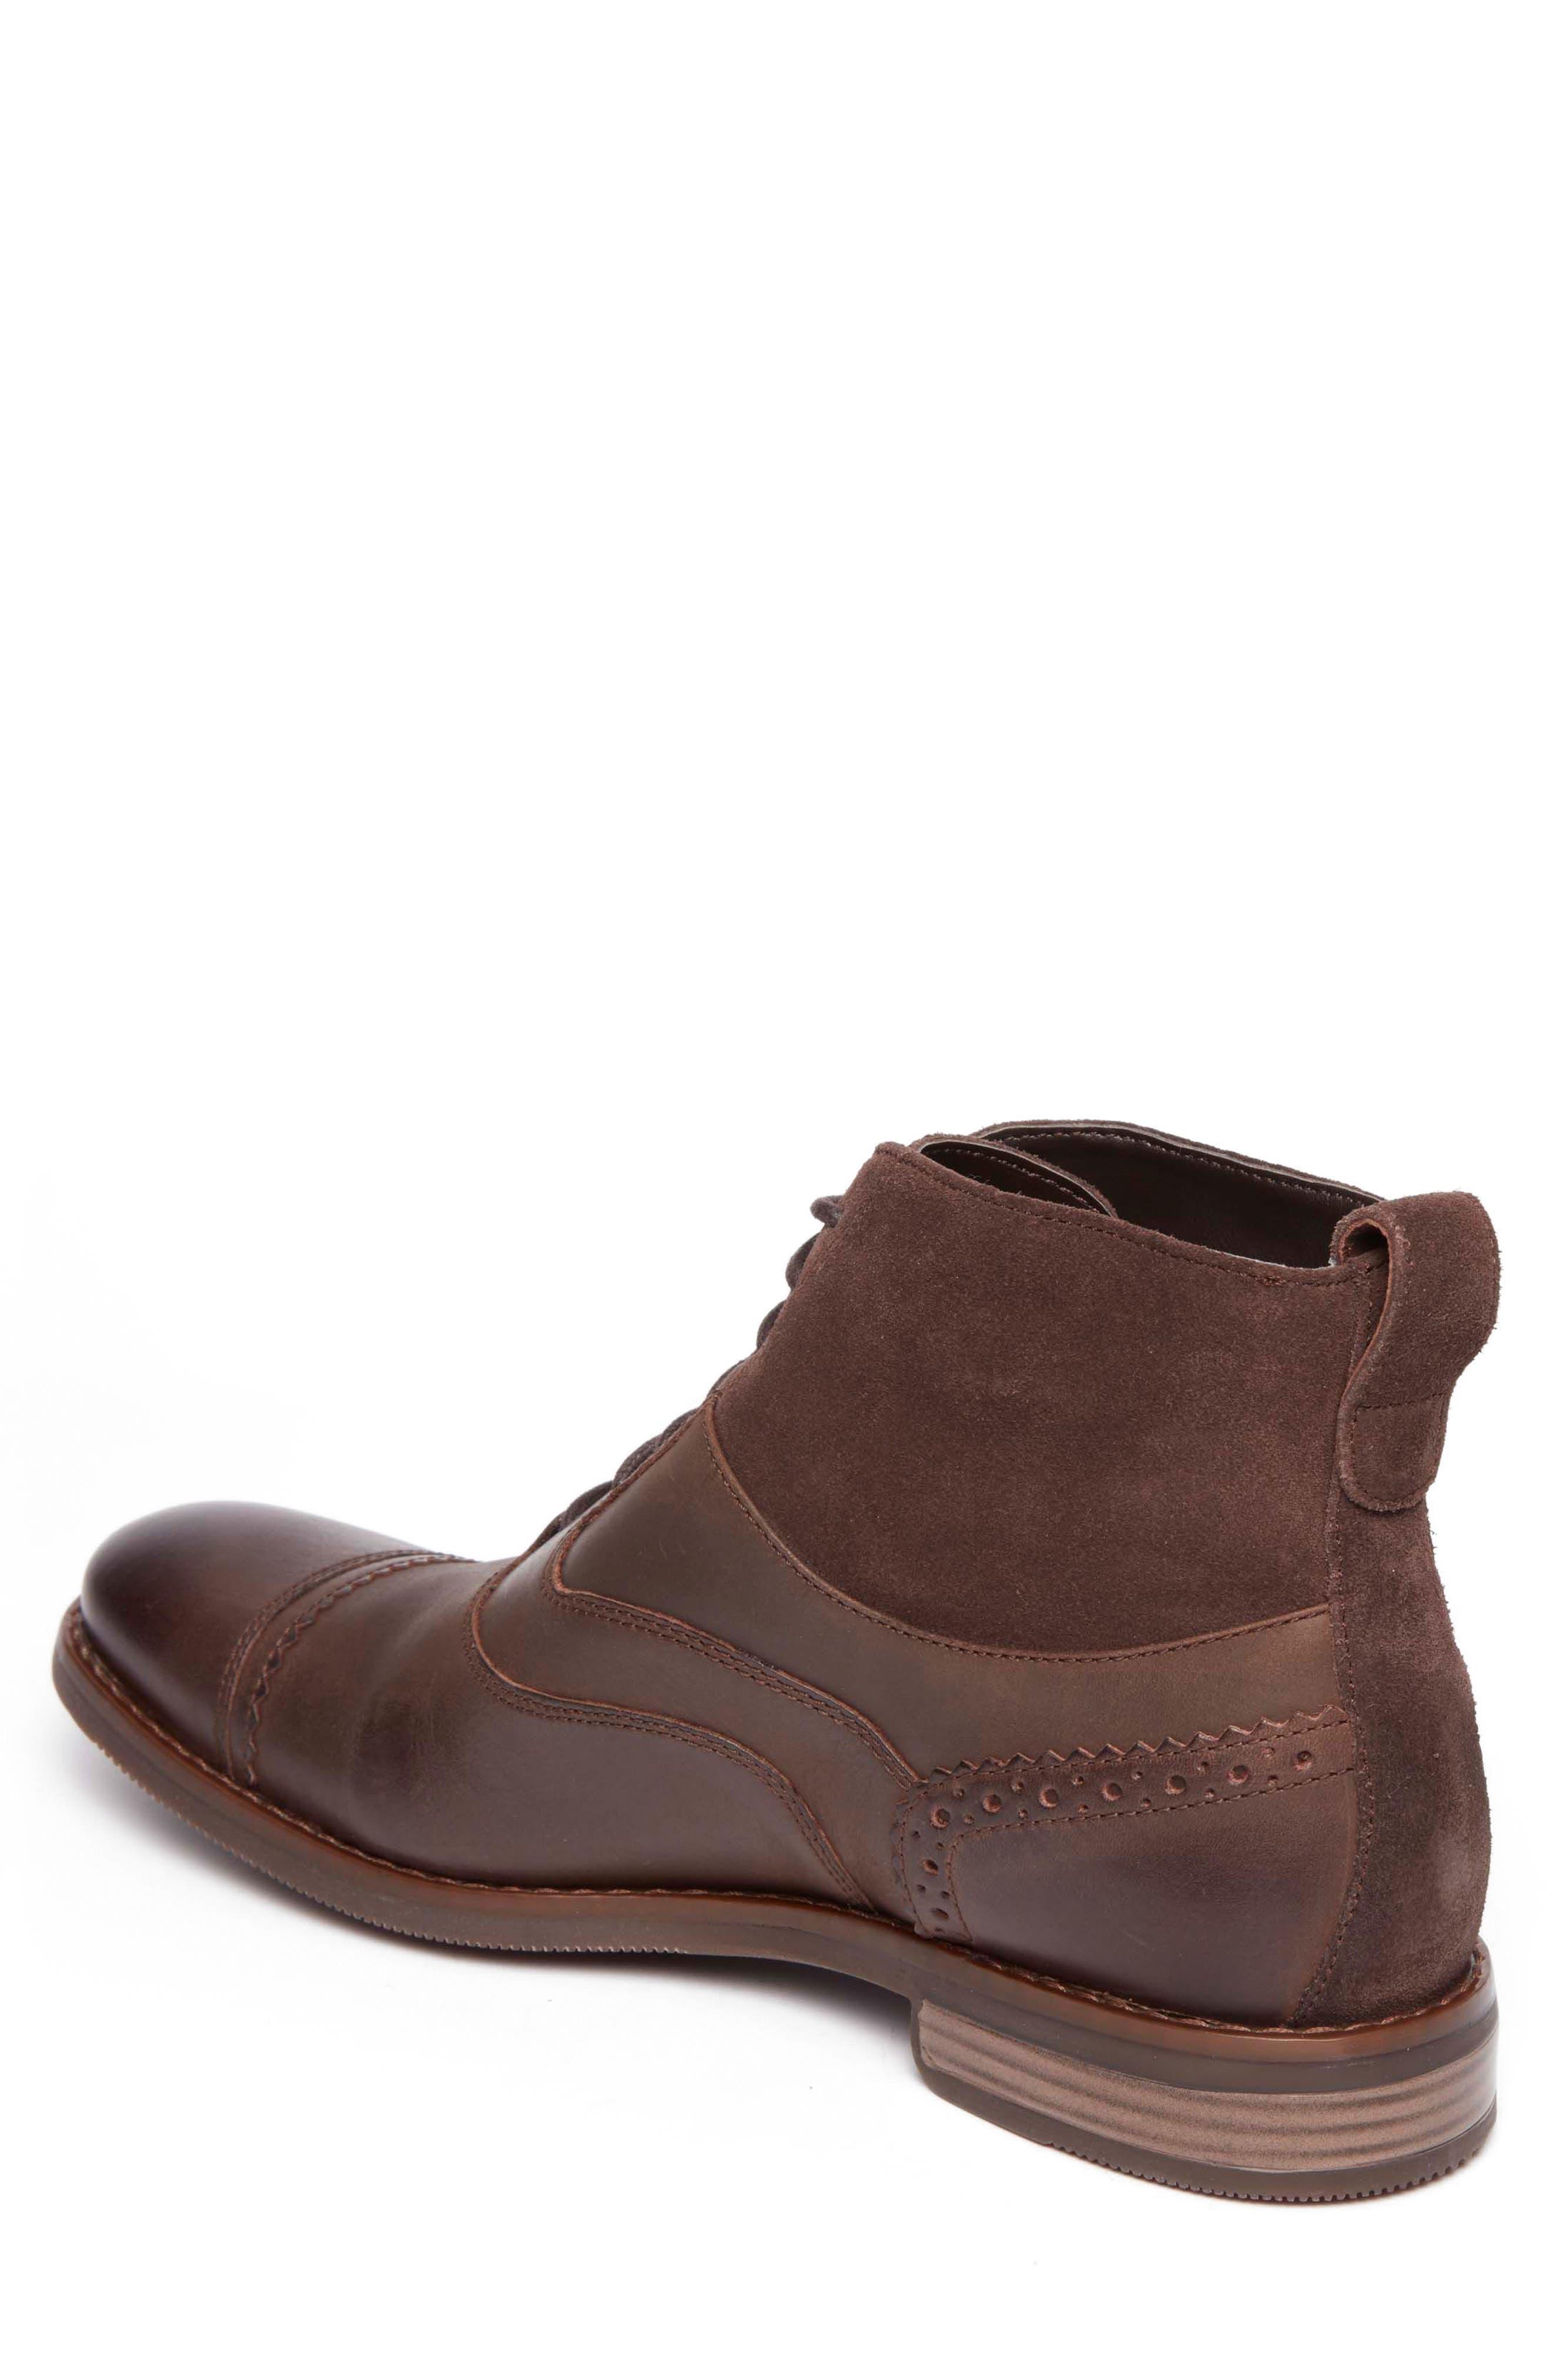 Wynstin Cap Toe Boot,                             Alternate thumbnail 2, color,                             Dark Chocolate Leather